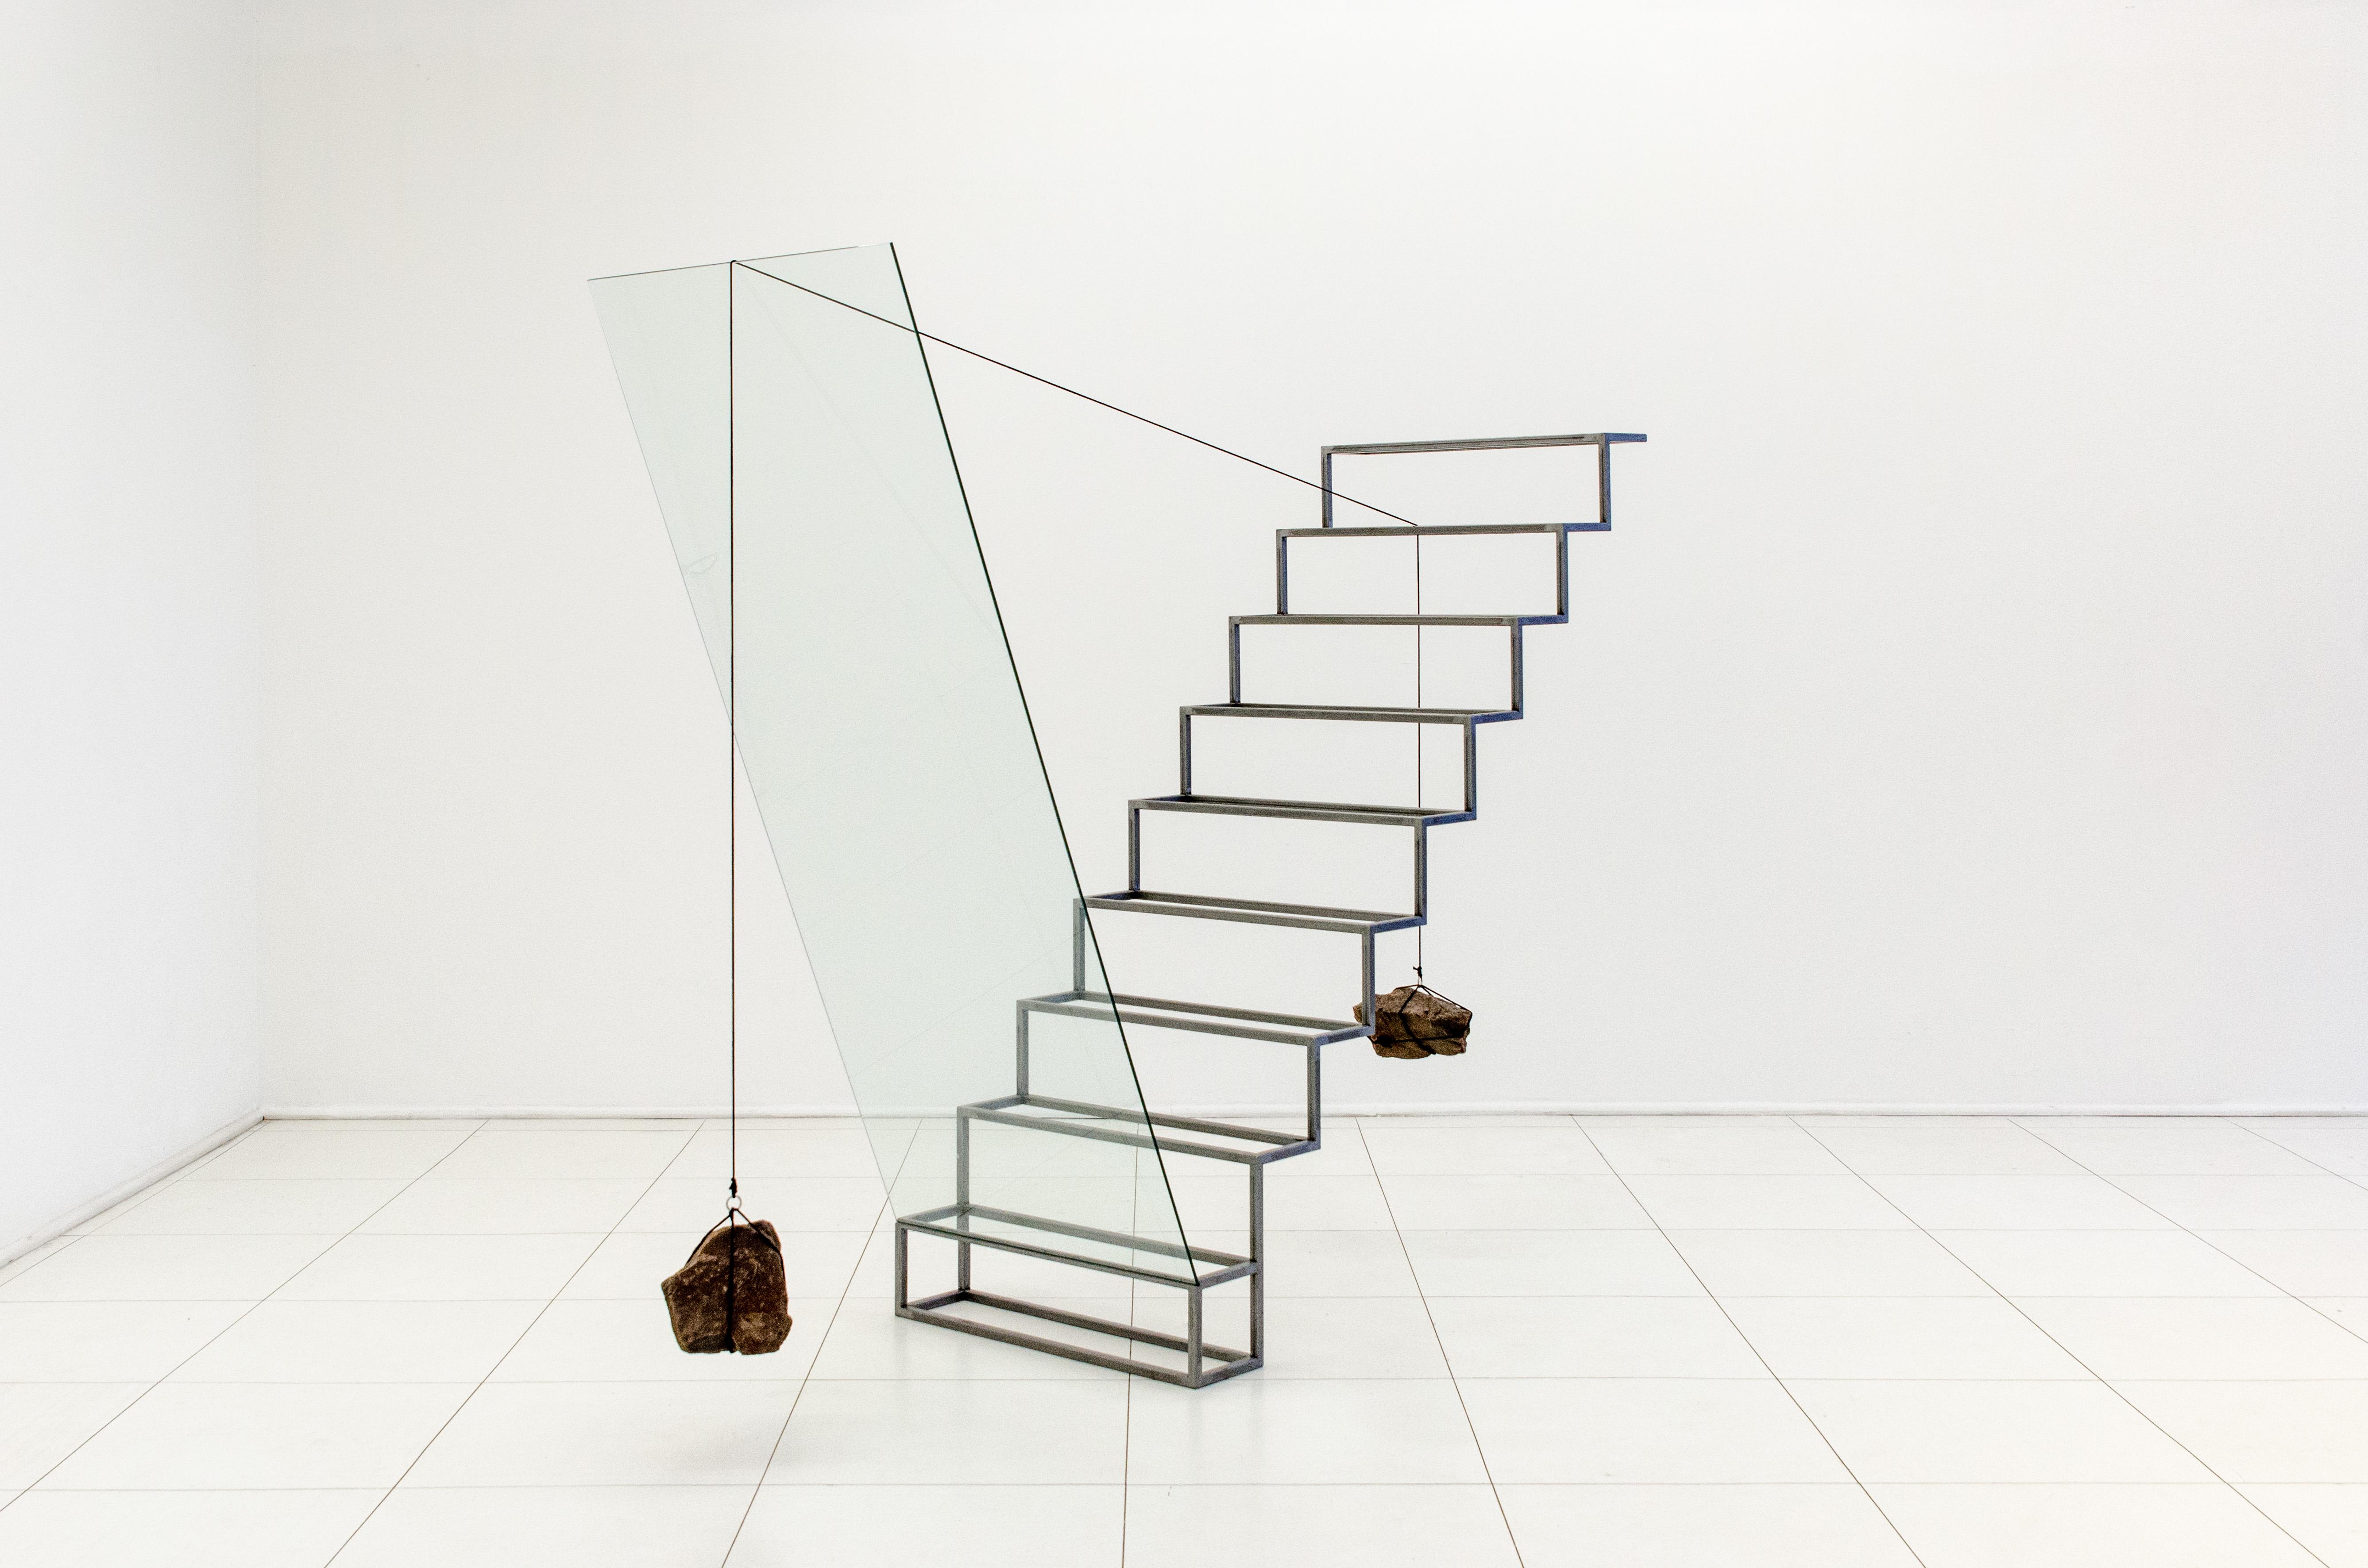 Tulio Pinto Nadir No 8 2014 Steel Ladder Glass Rope and Stones 204x260x80cm